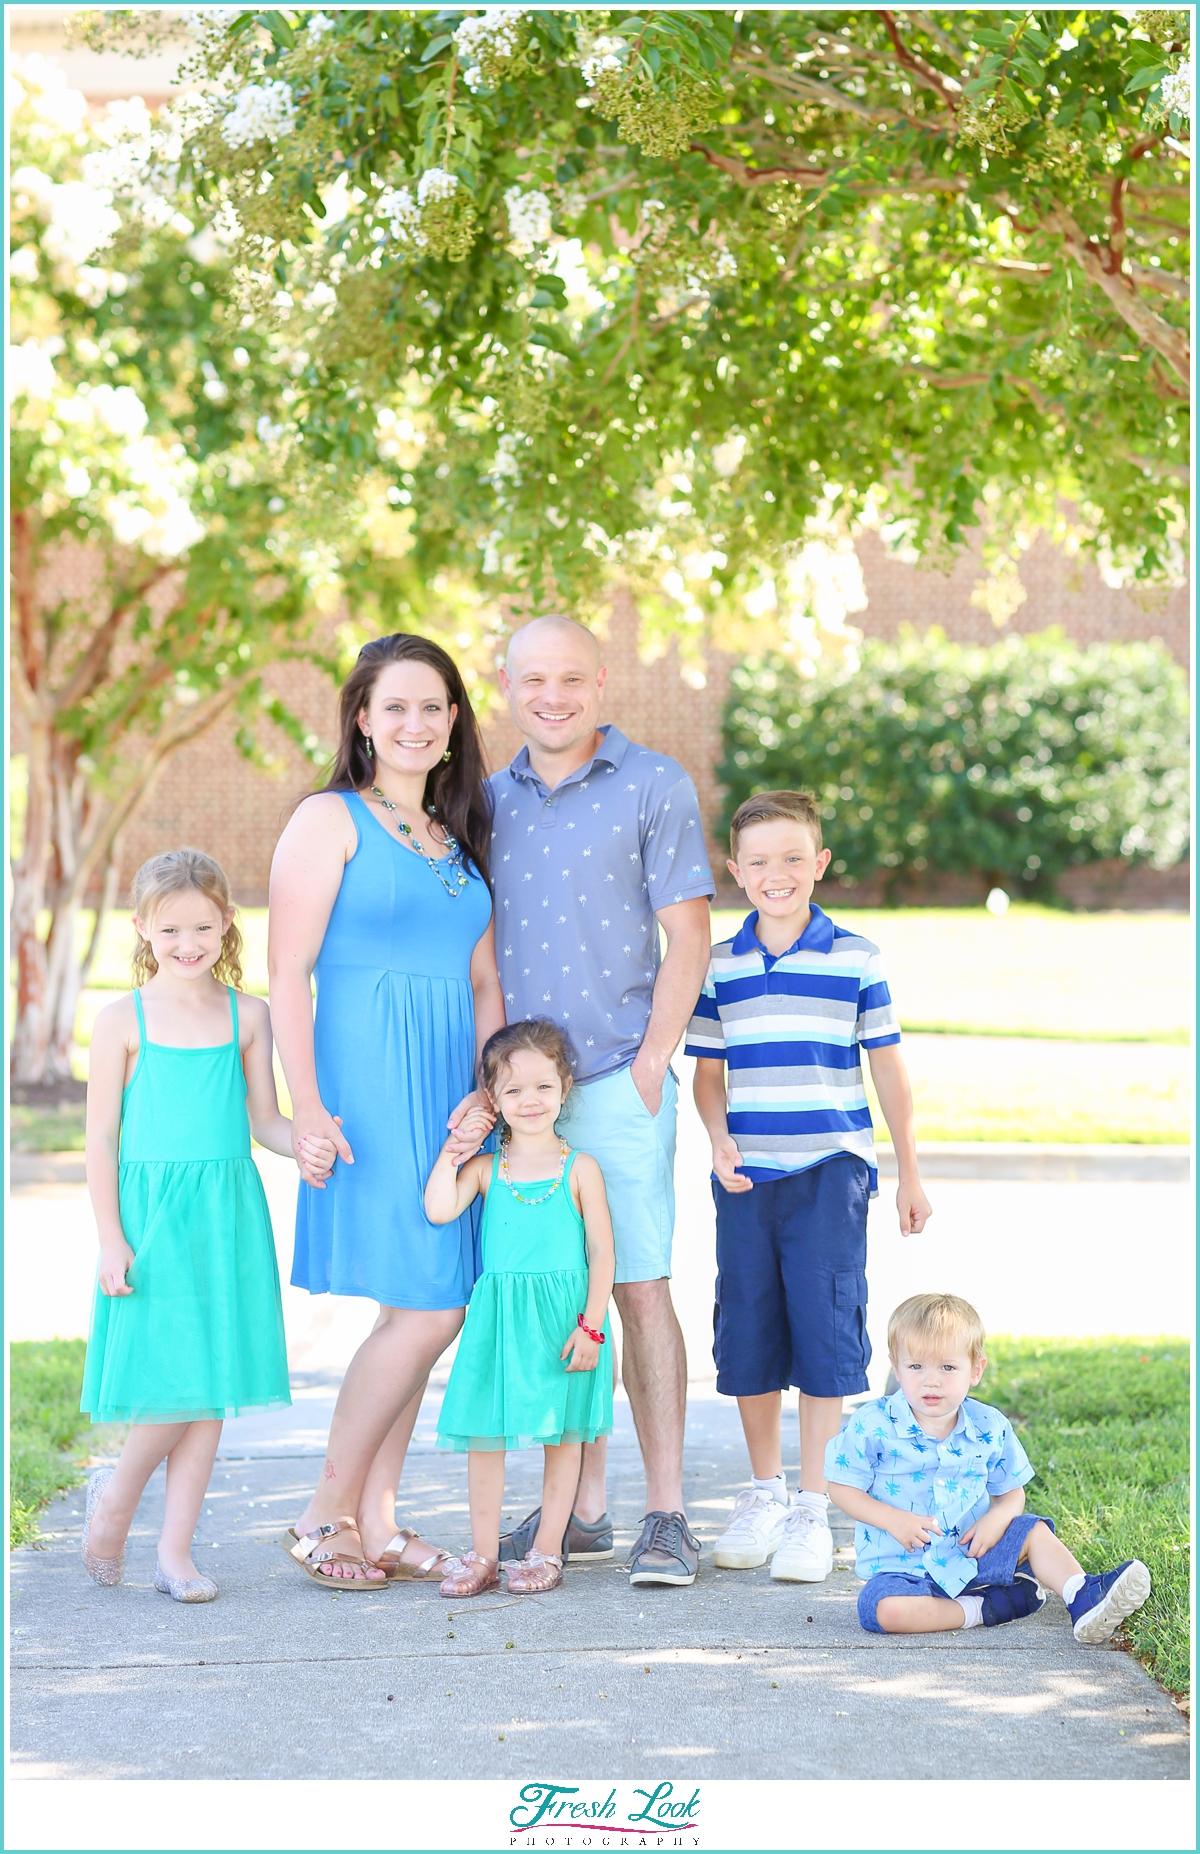 spring family photoshoot ideas